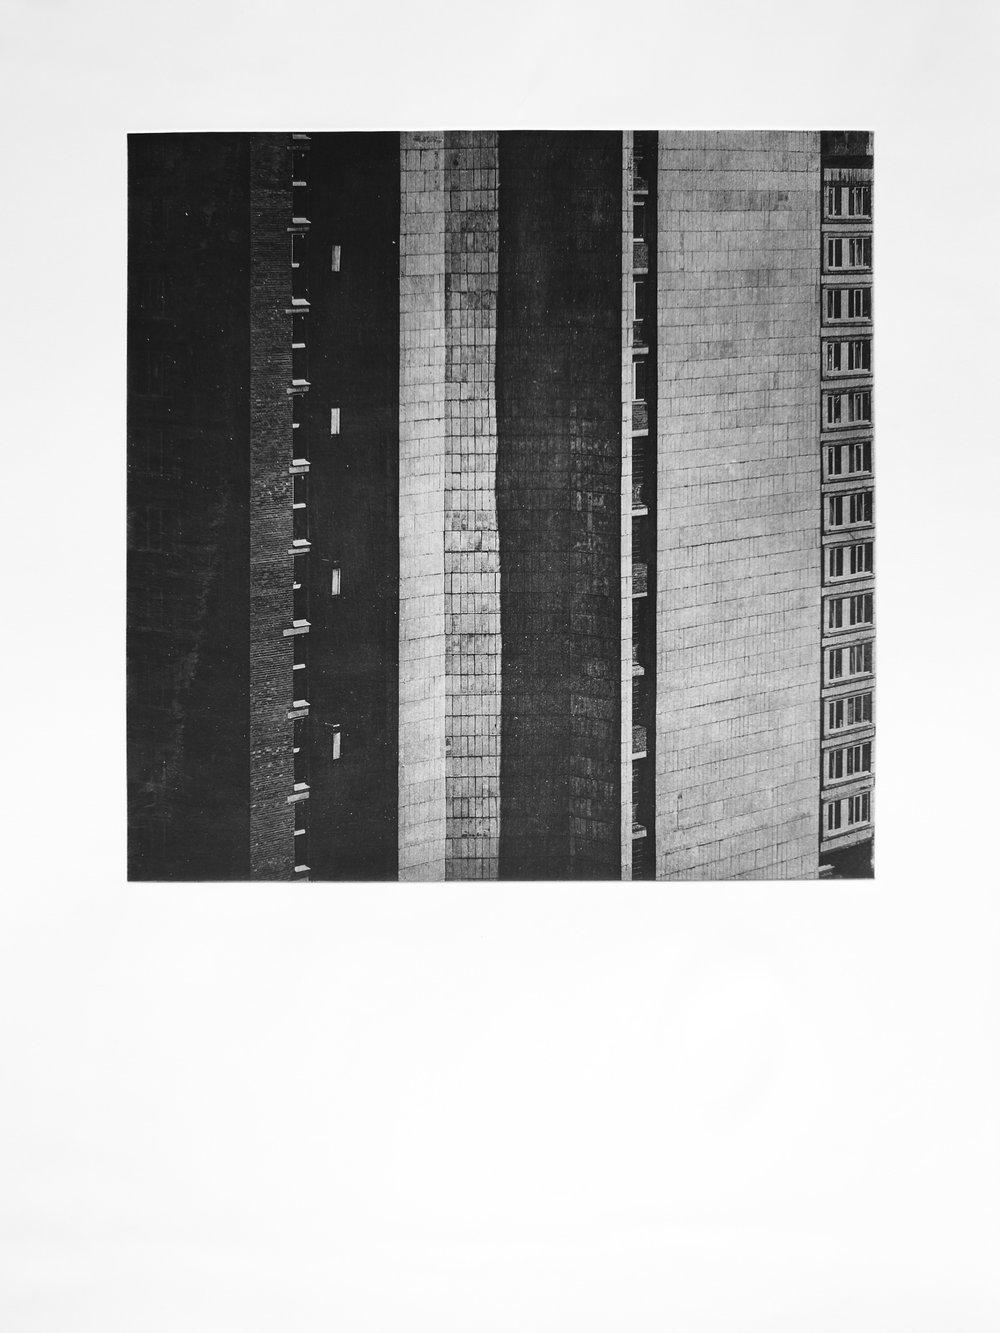 Der Bau iII (2017)  medium: Heliogravüre  size: 60 x 80 cm  paper: Zerkall 270 g/qm  plate: 44 x 44 cm  edition: 11 copies  numbered: 1/7 - 7/7, 4 e.a.  printer: FWU